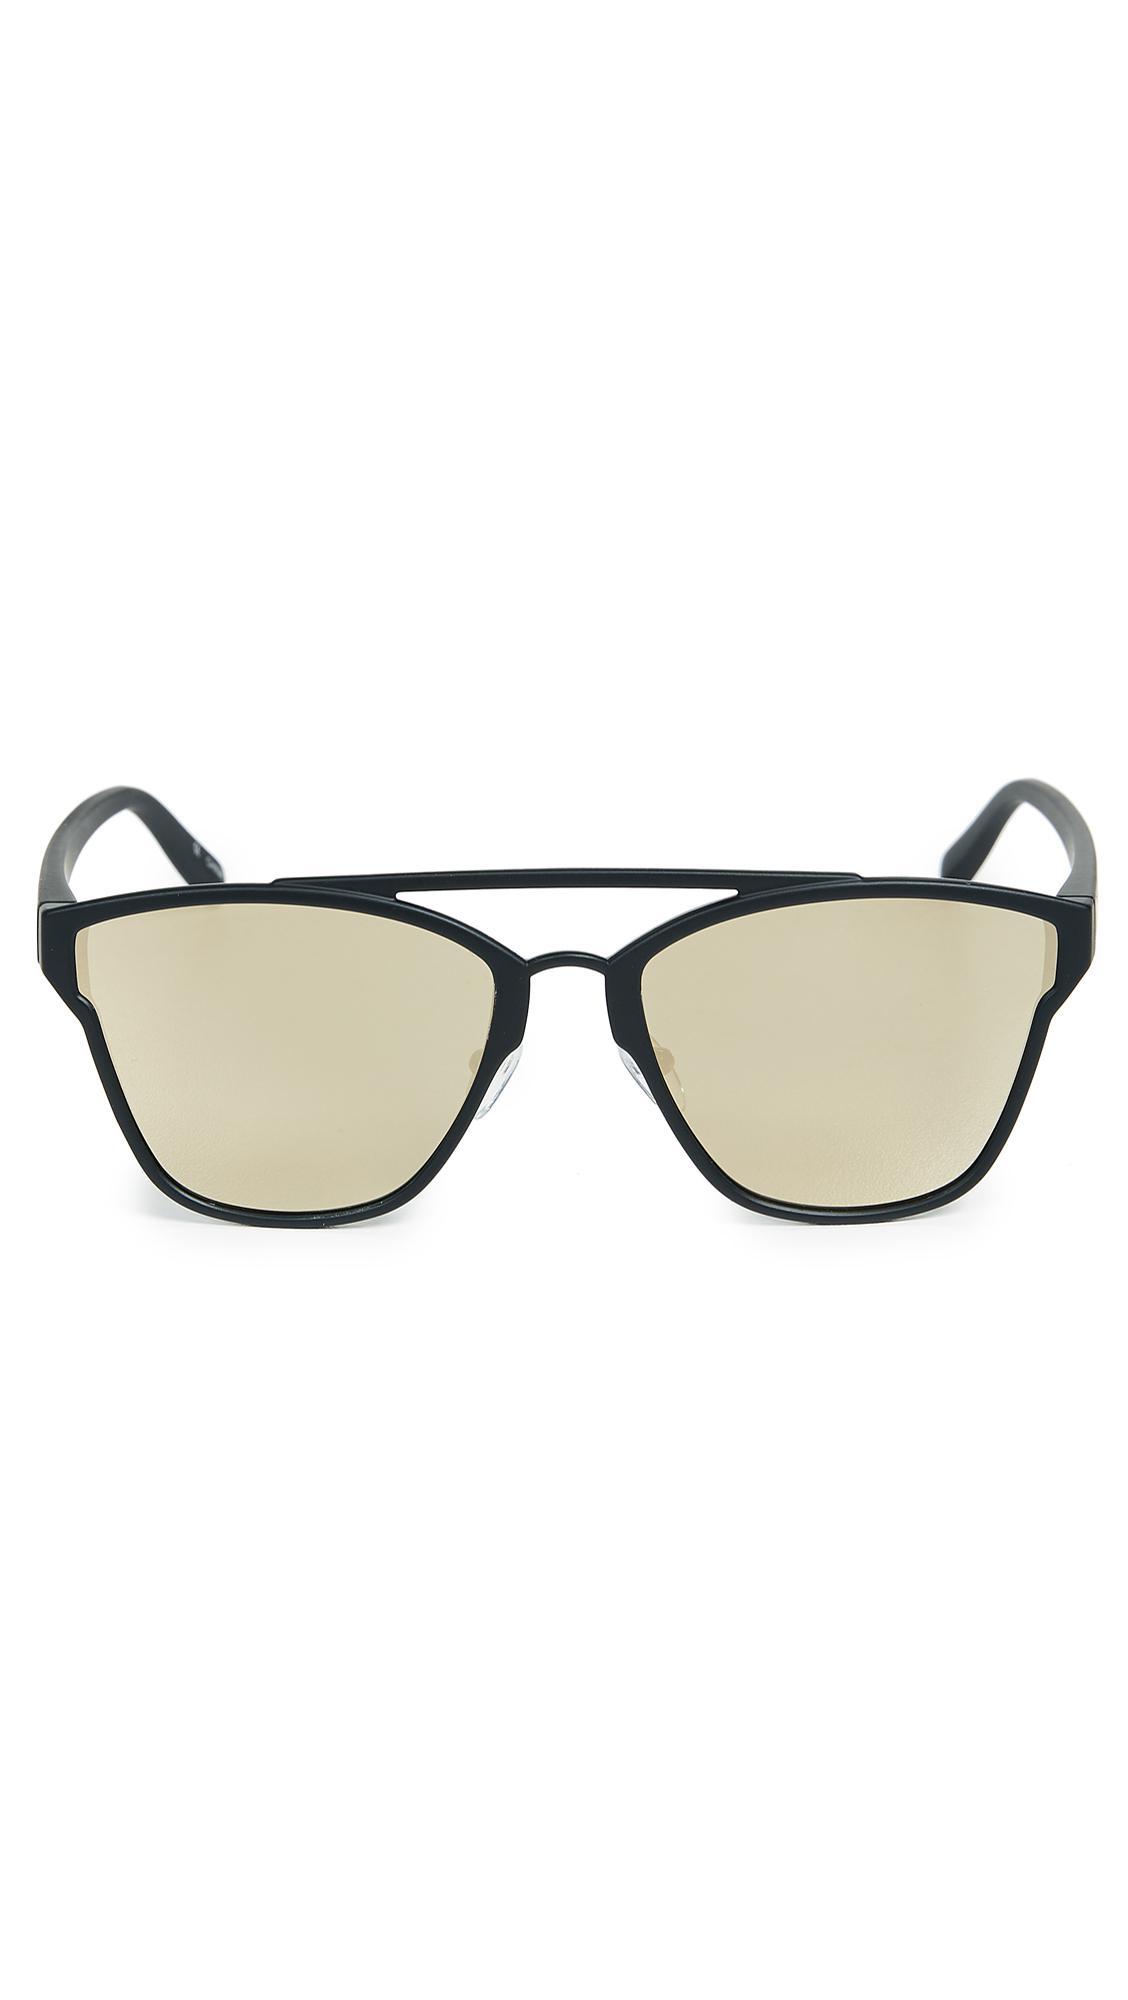 Le Specs Herstory Sunglasses in Black for Men